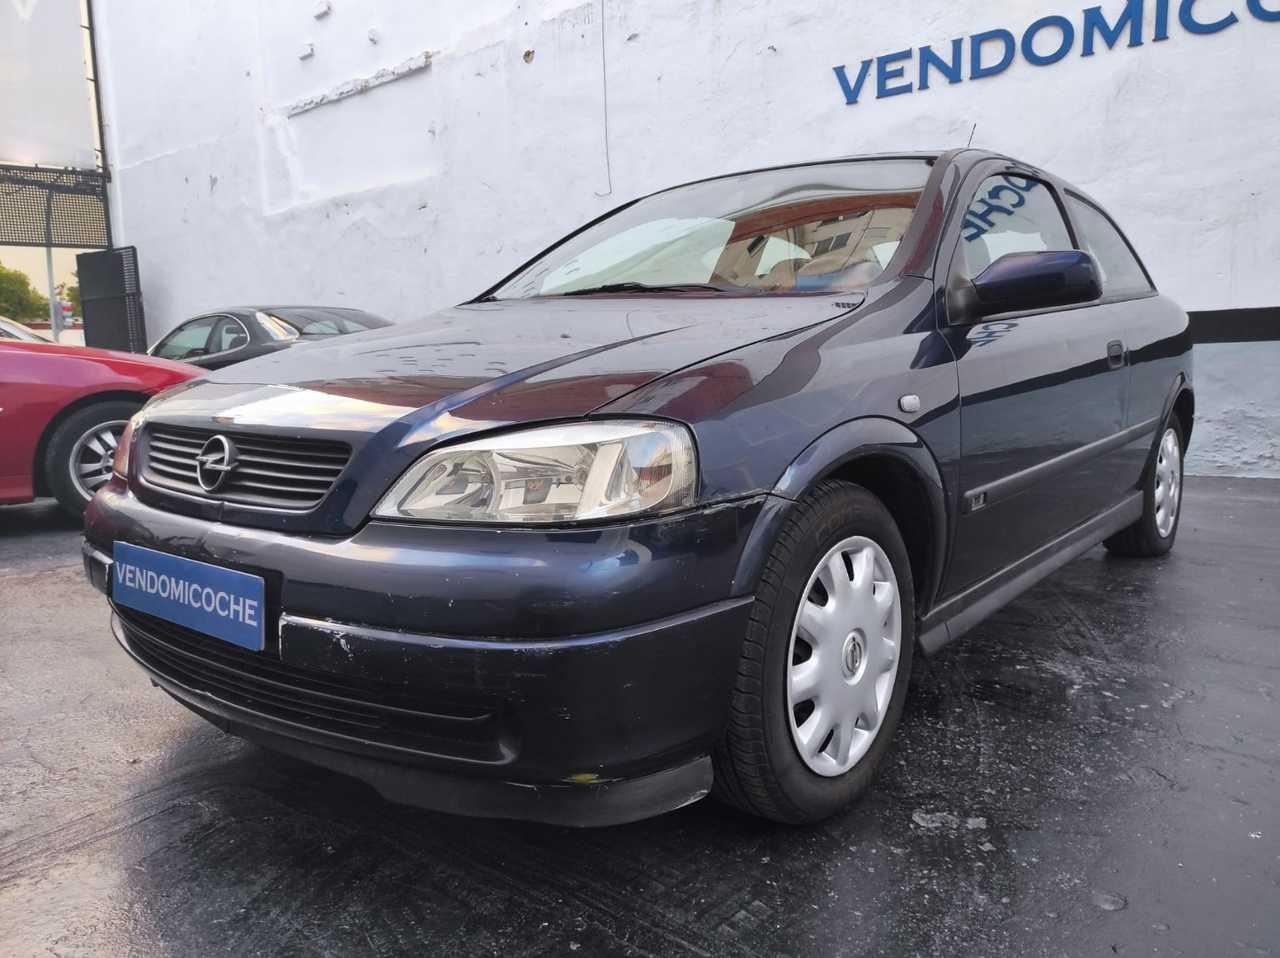 Opel Astra 1.6 16v Edition 3p.   - Foto 1